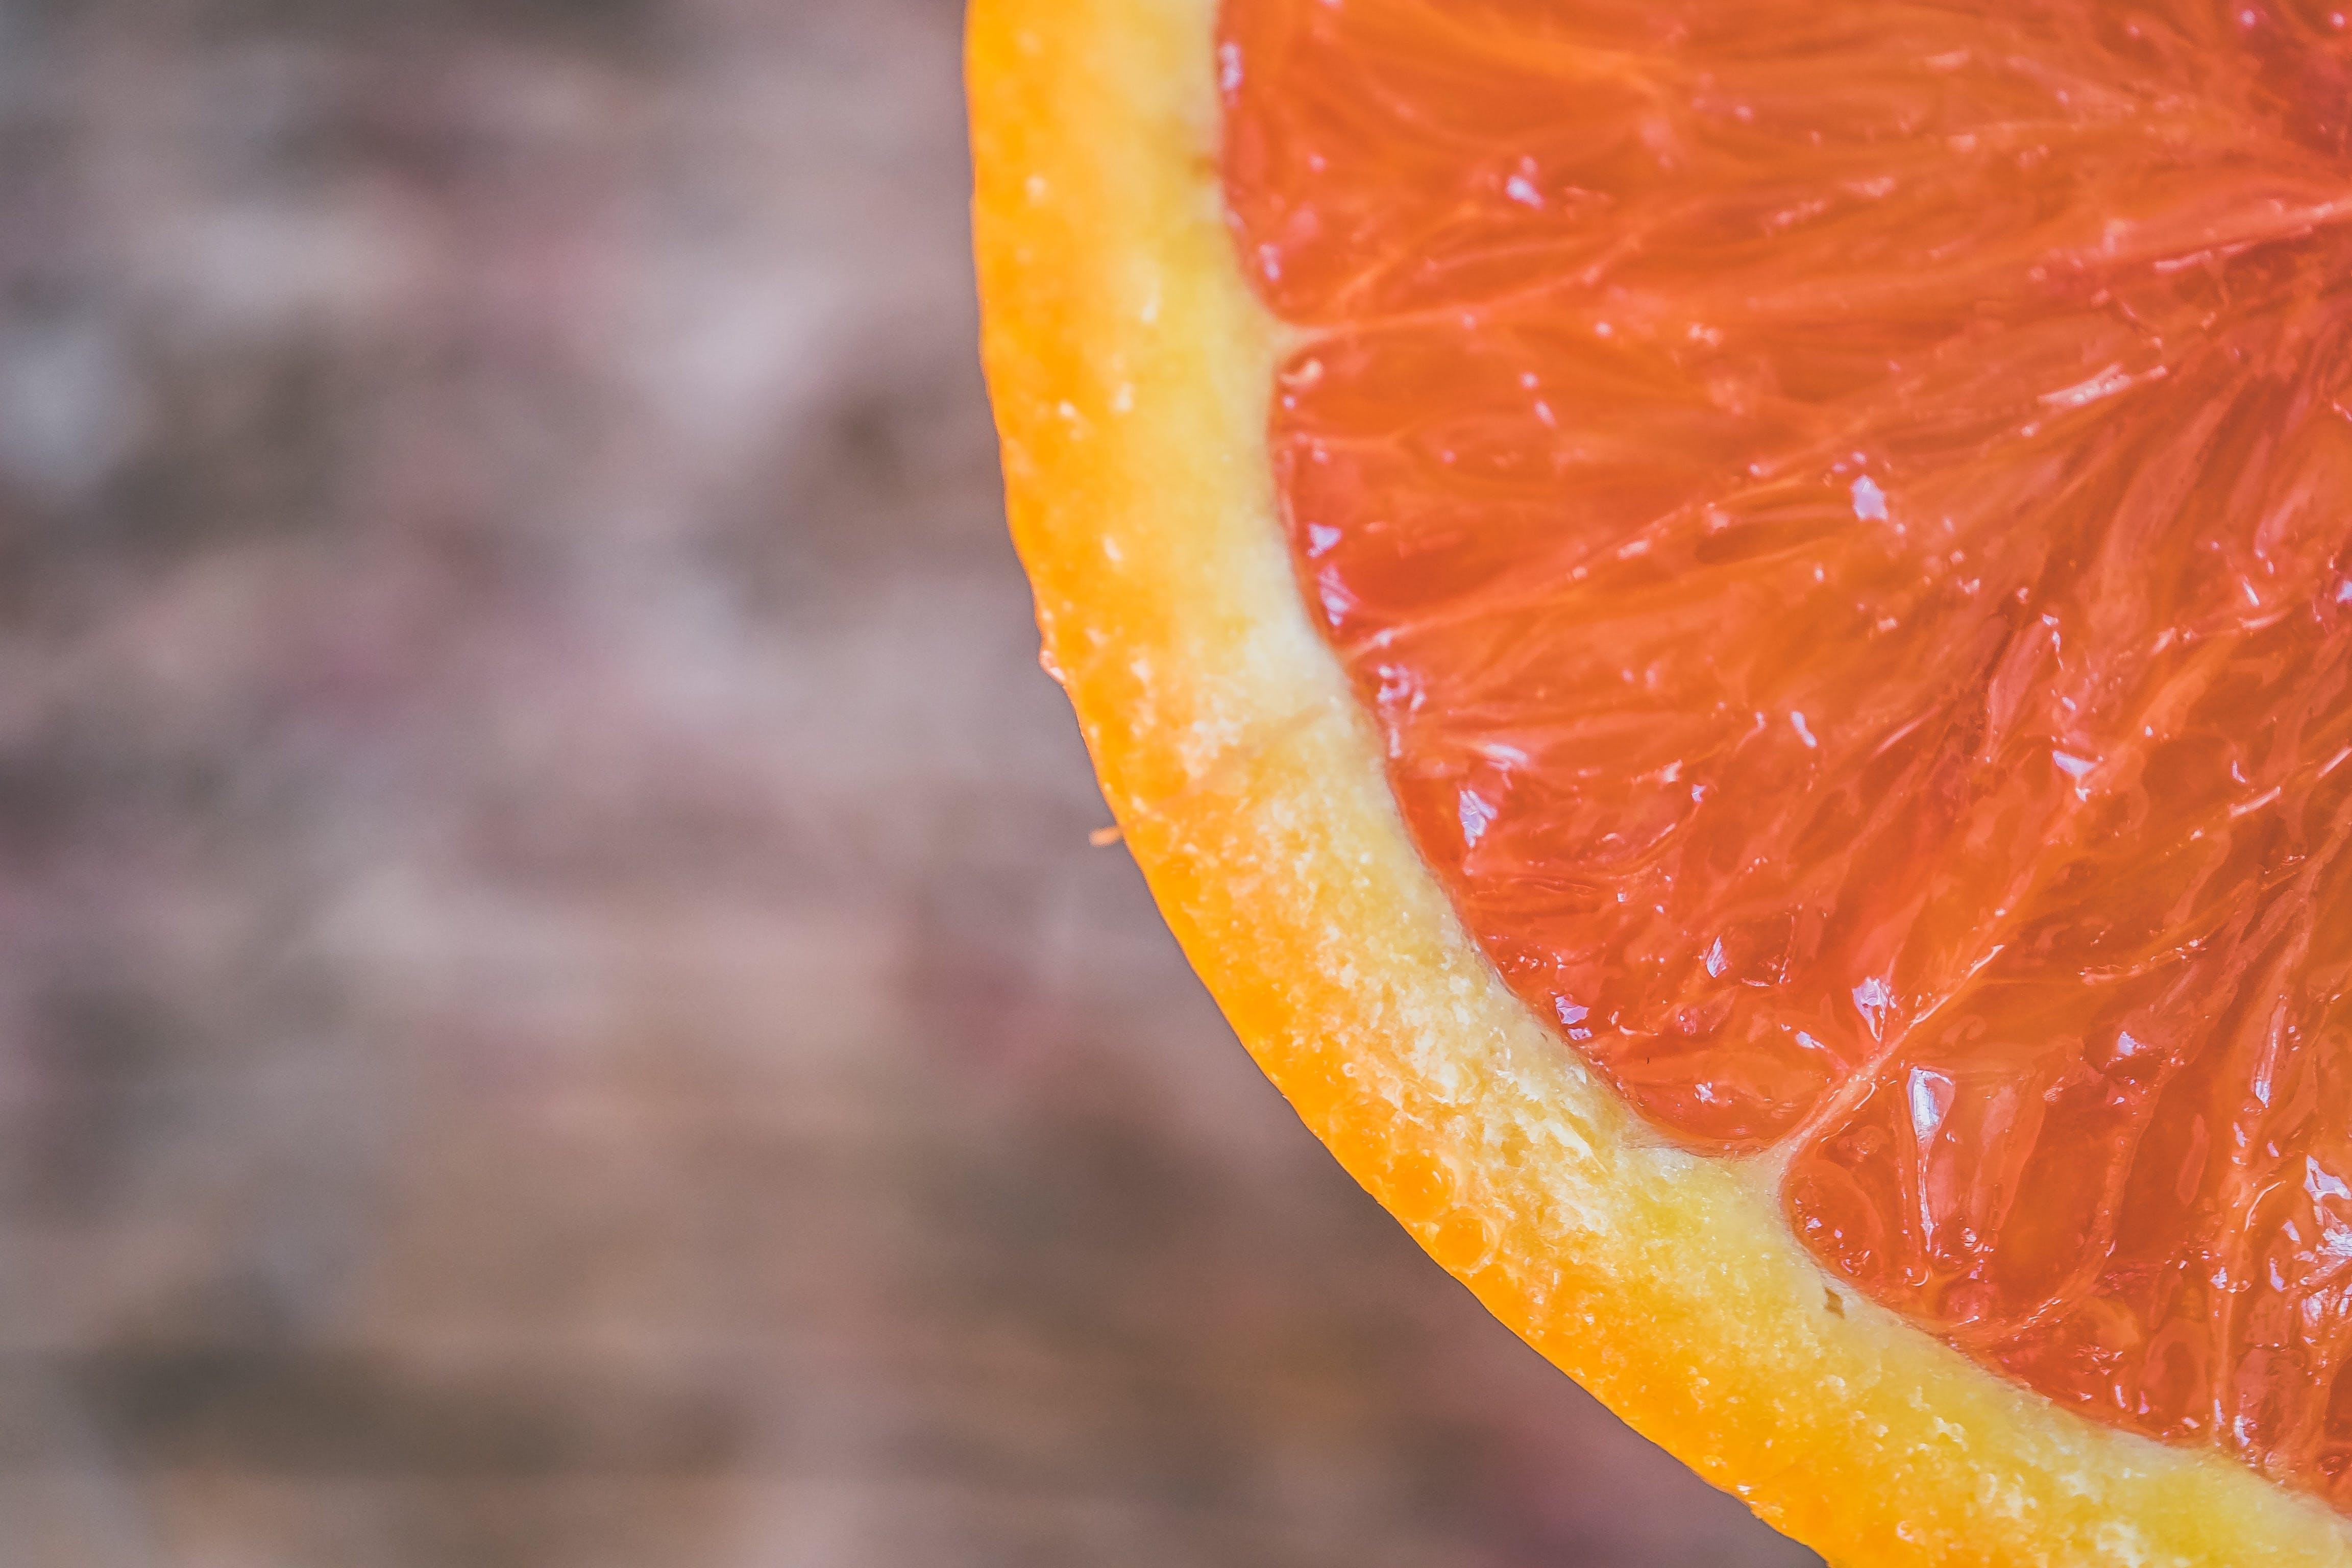 Gratis arkivbilde med appelsin, delikat, farger, nærbilde